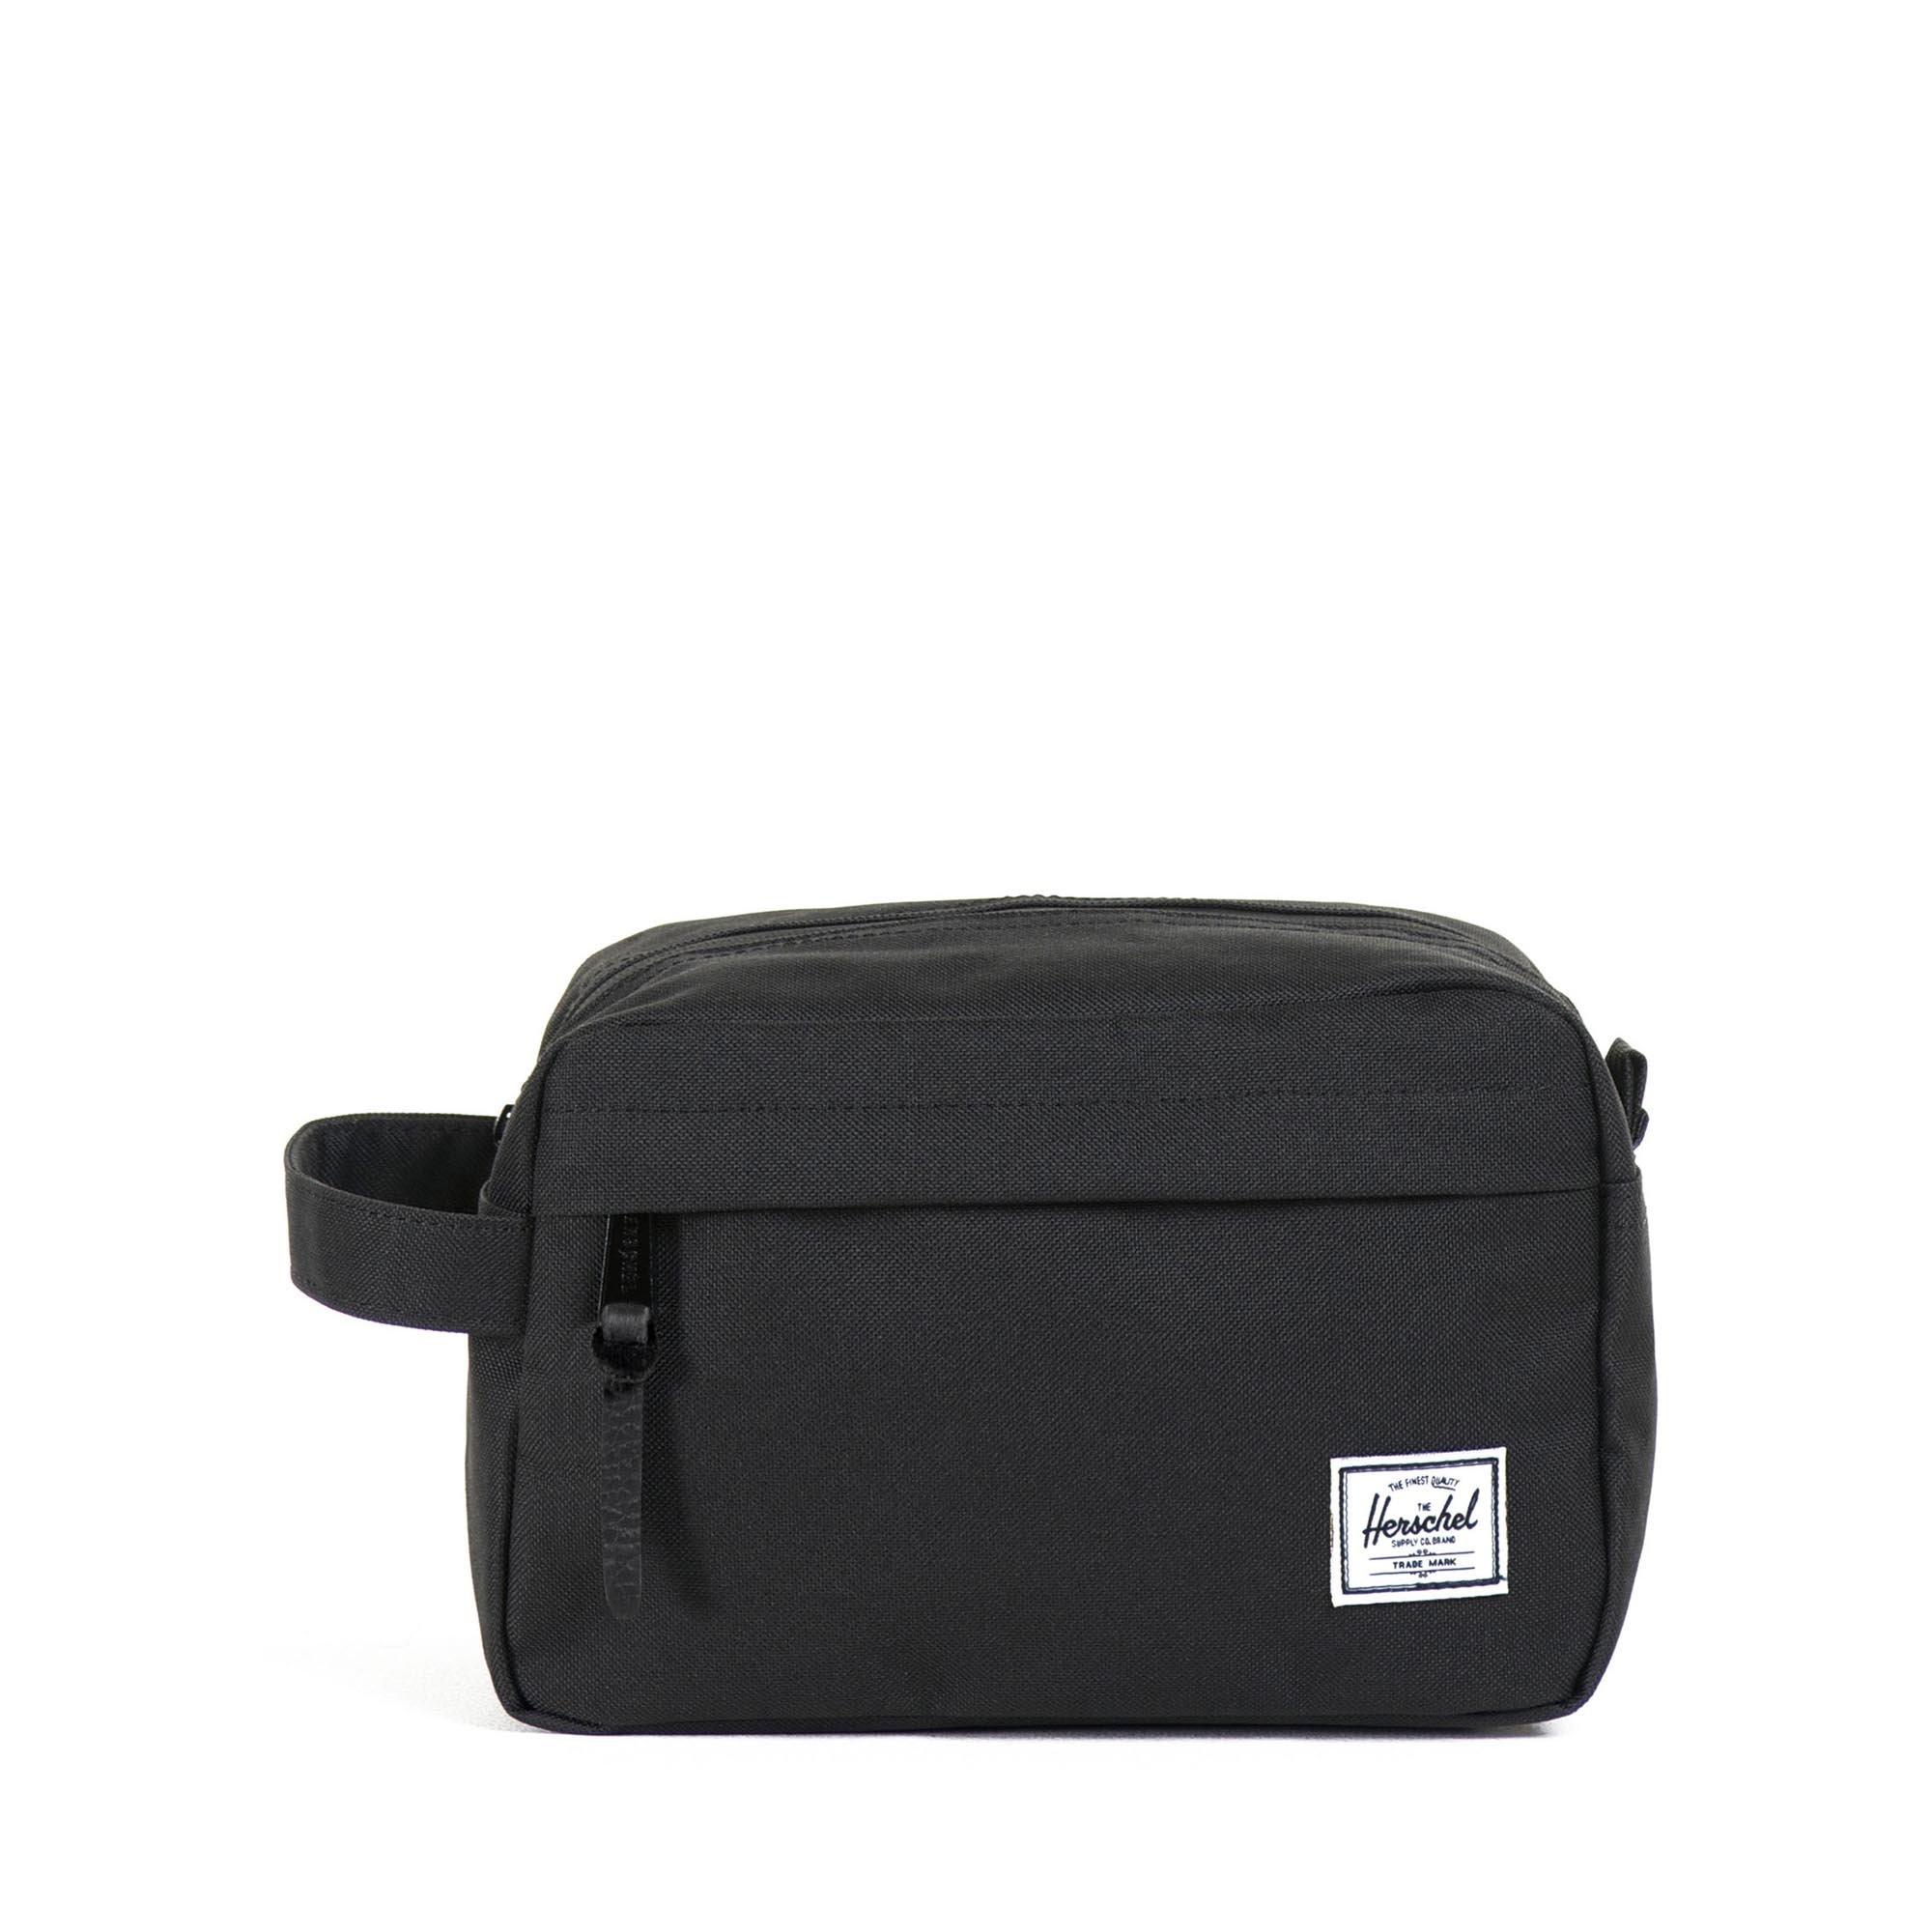 Herschel Supply Co. Chapter Travel Kit,Black,One Size by Herschel Supply Co. (Image #1)